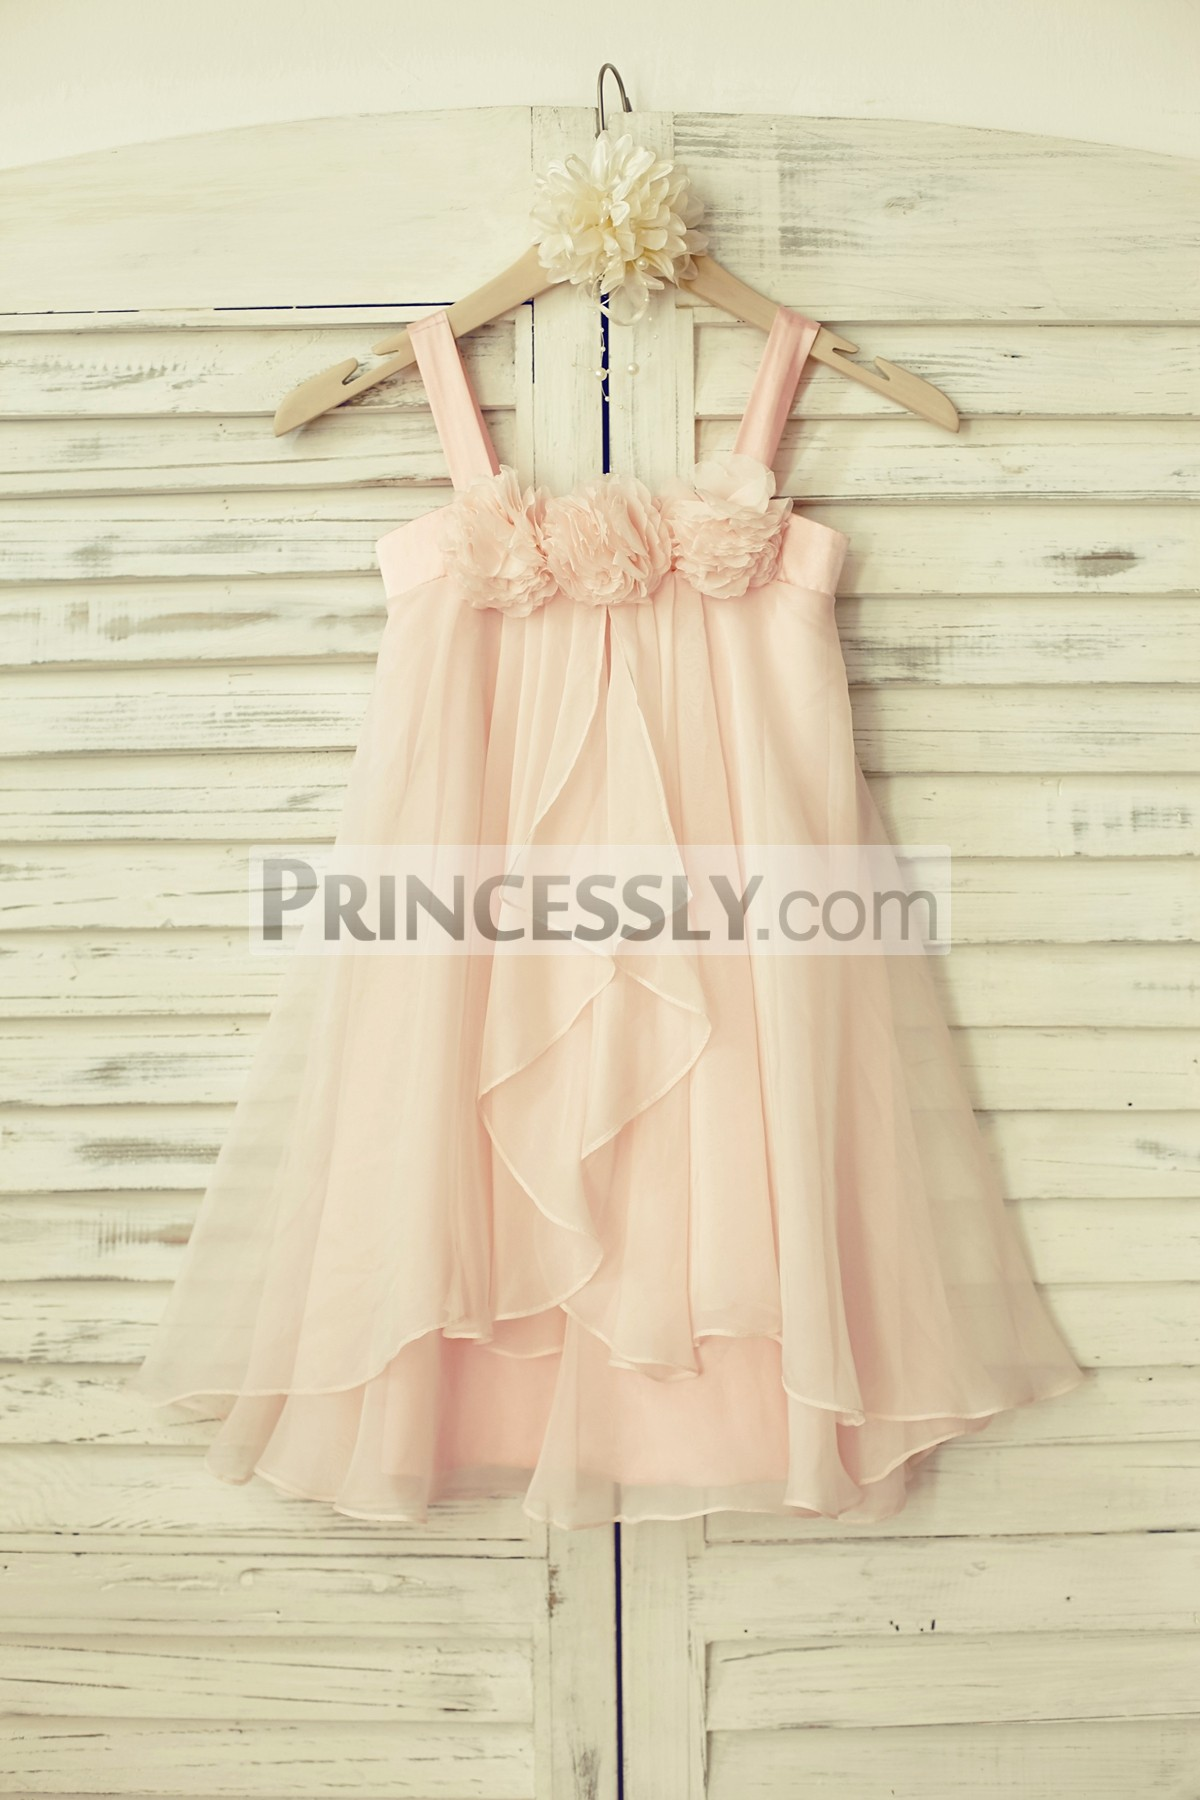 Boho Blush Pink Chiffon Thin Straps Flowers Overlay Flower Girl Dress